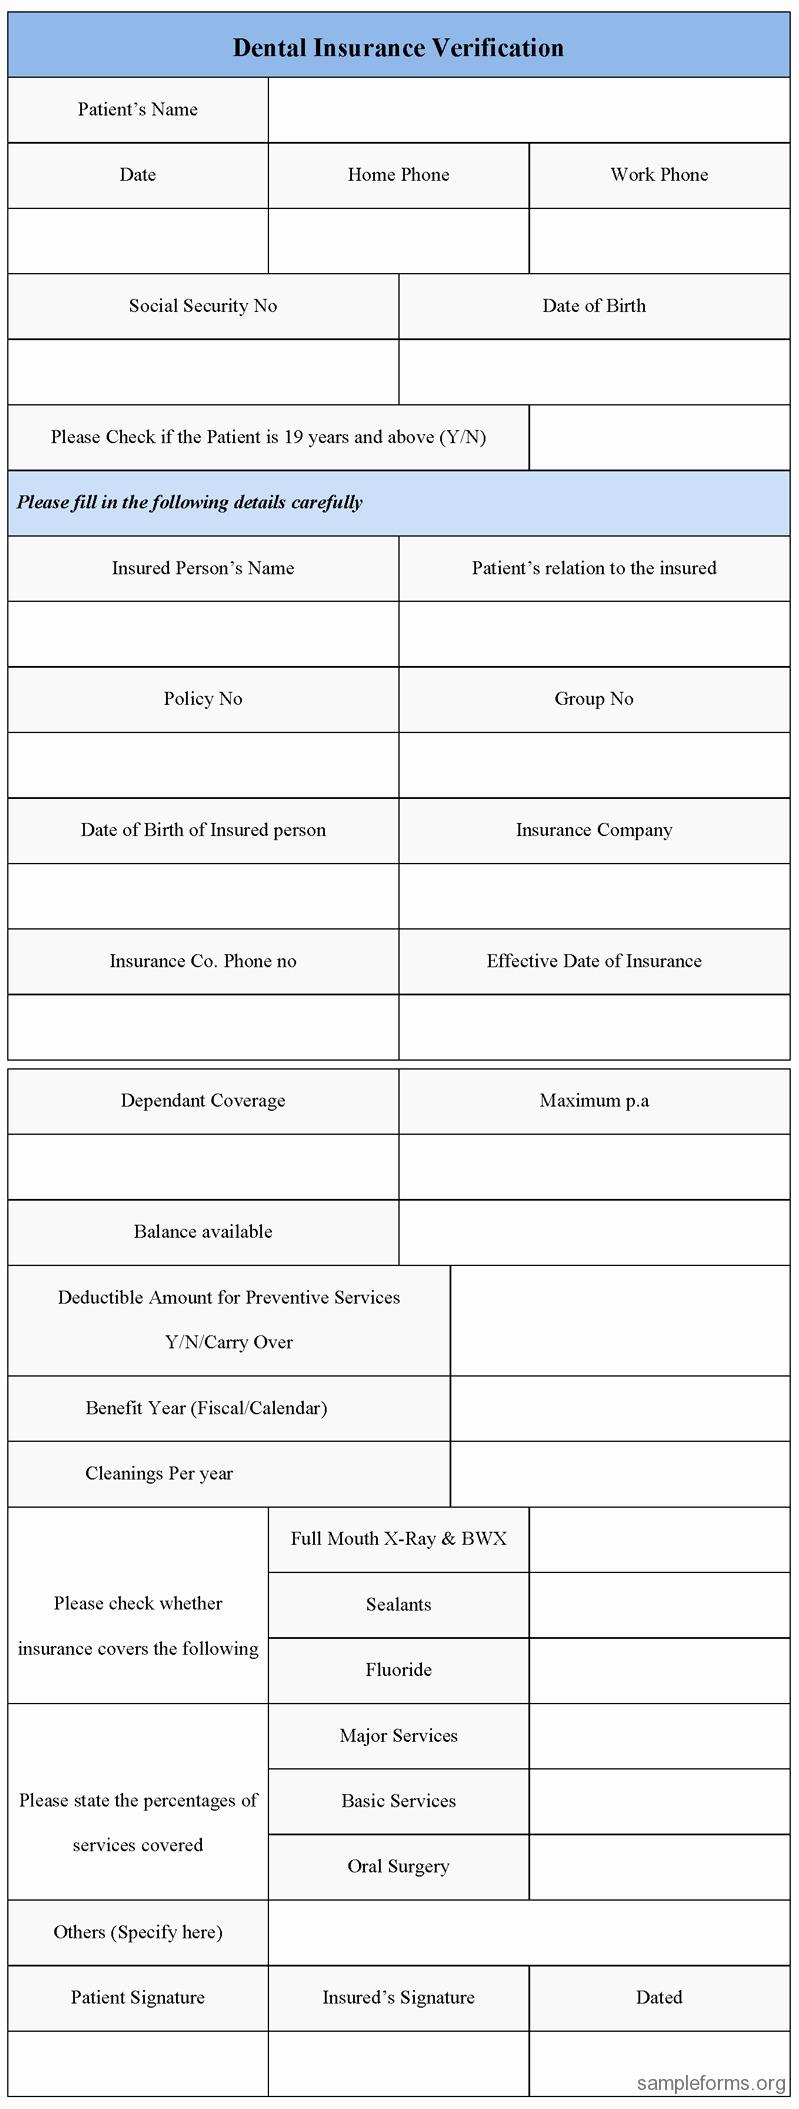 Dental Insurance Verification form Sample forms